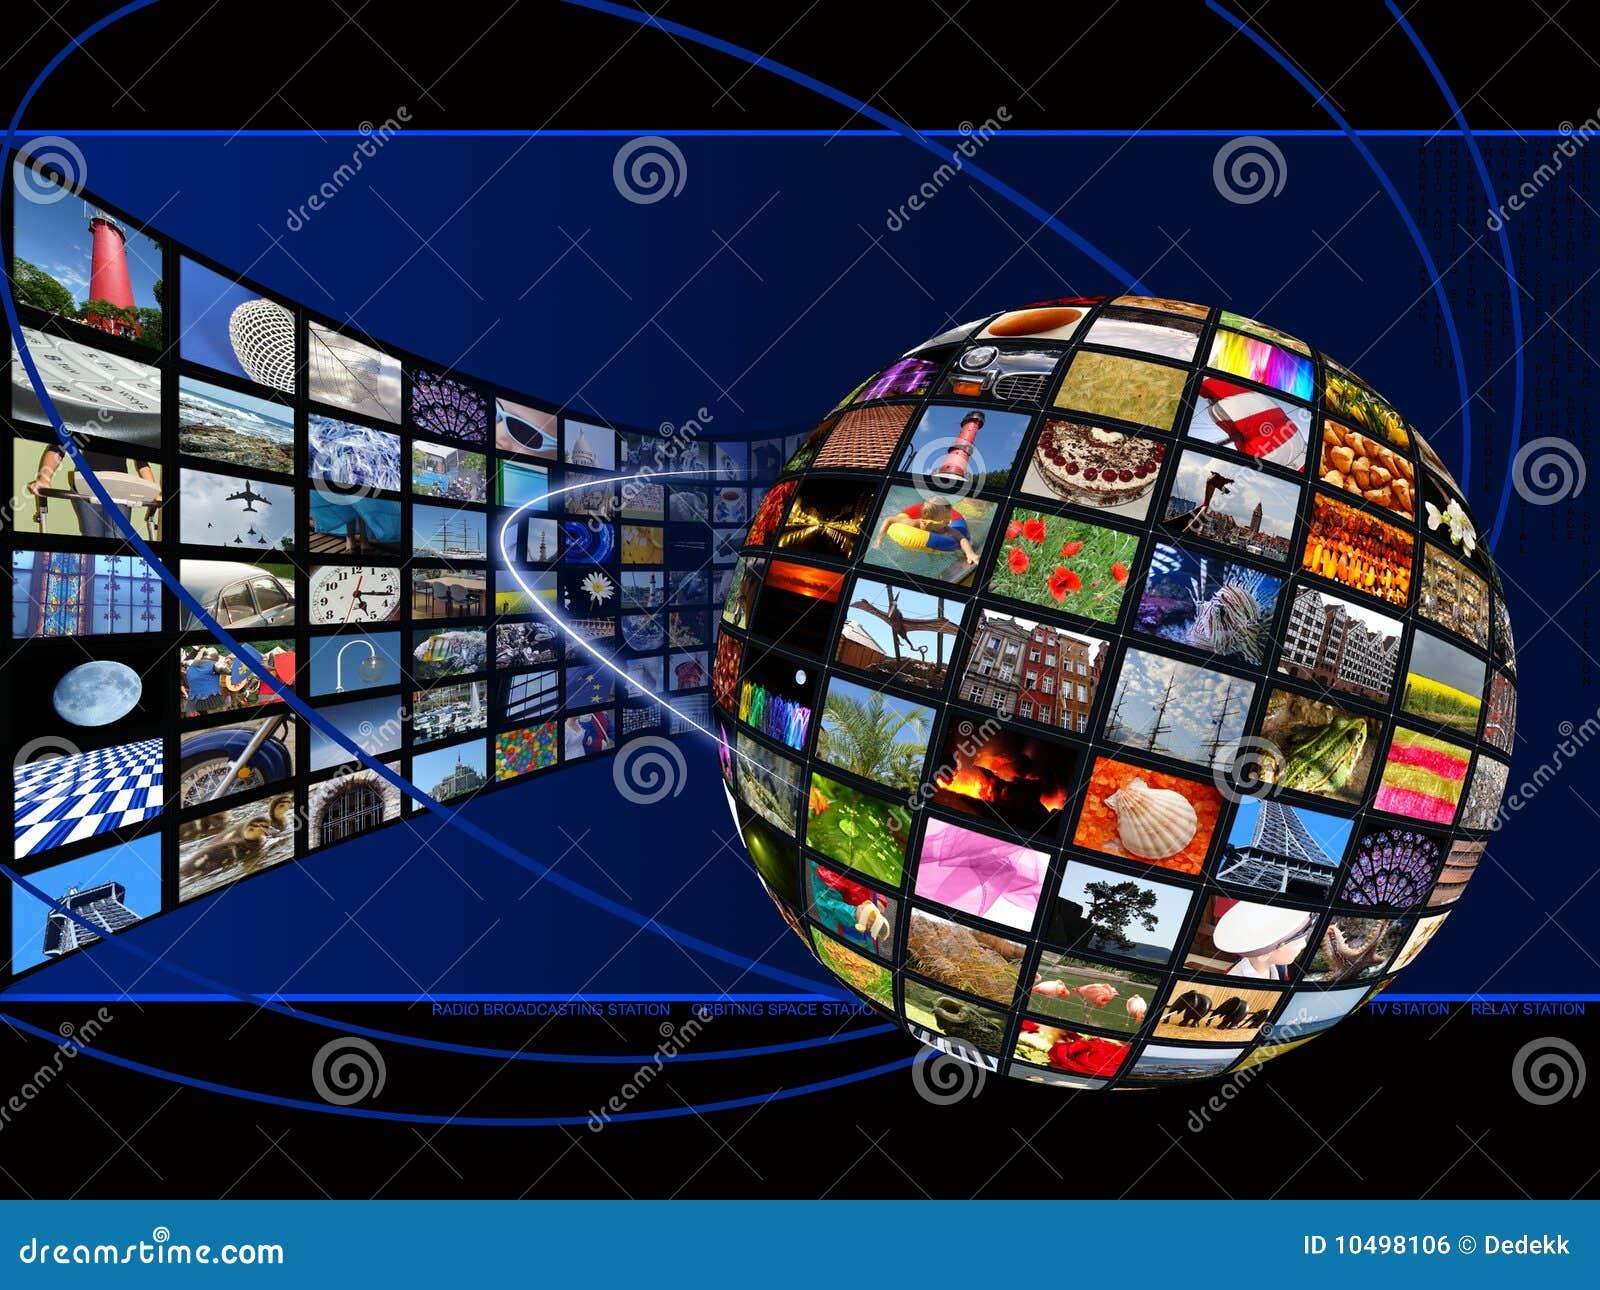 Спутниковые каналы телеканалы нтв онлайн бесплатно 10 фотография